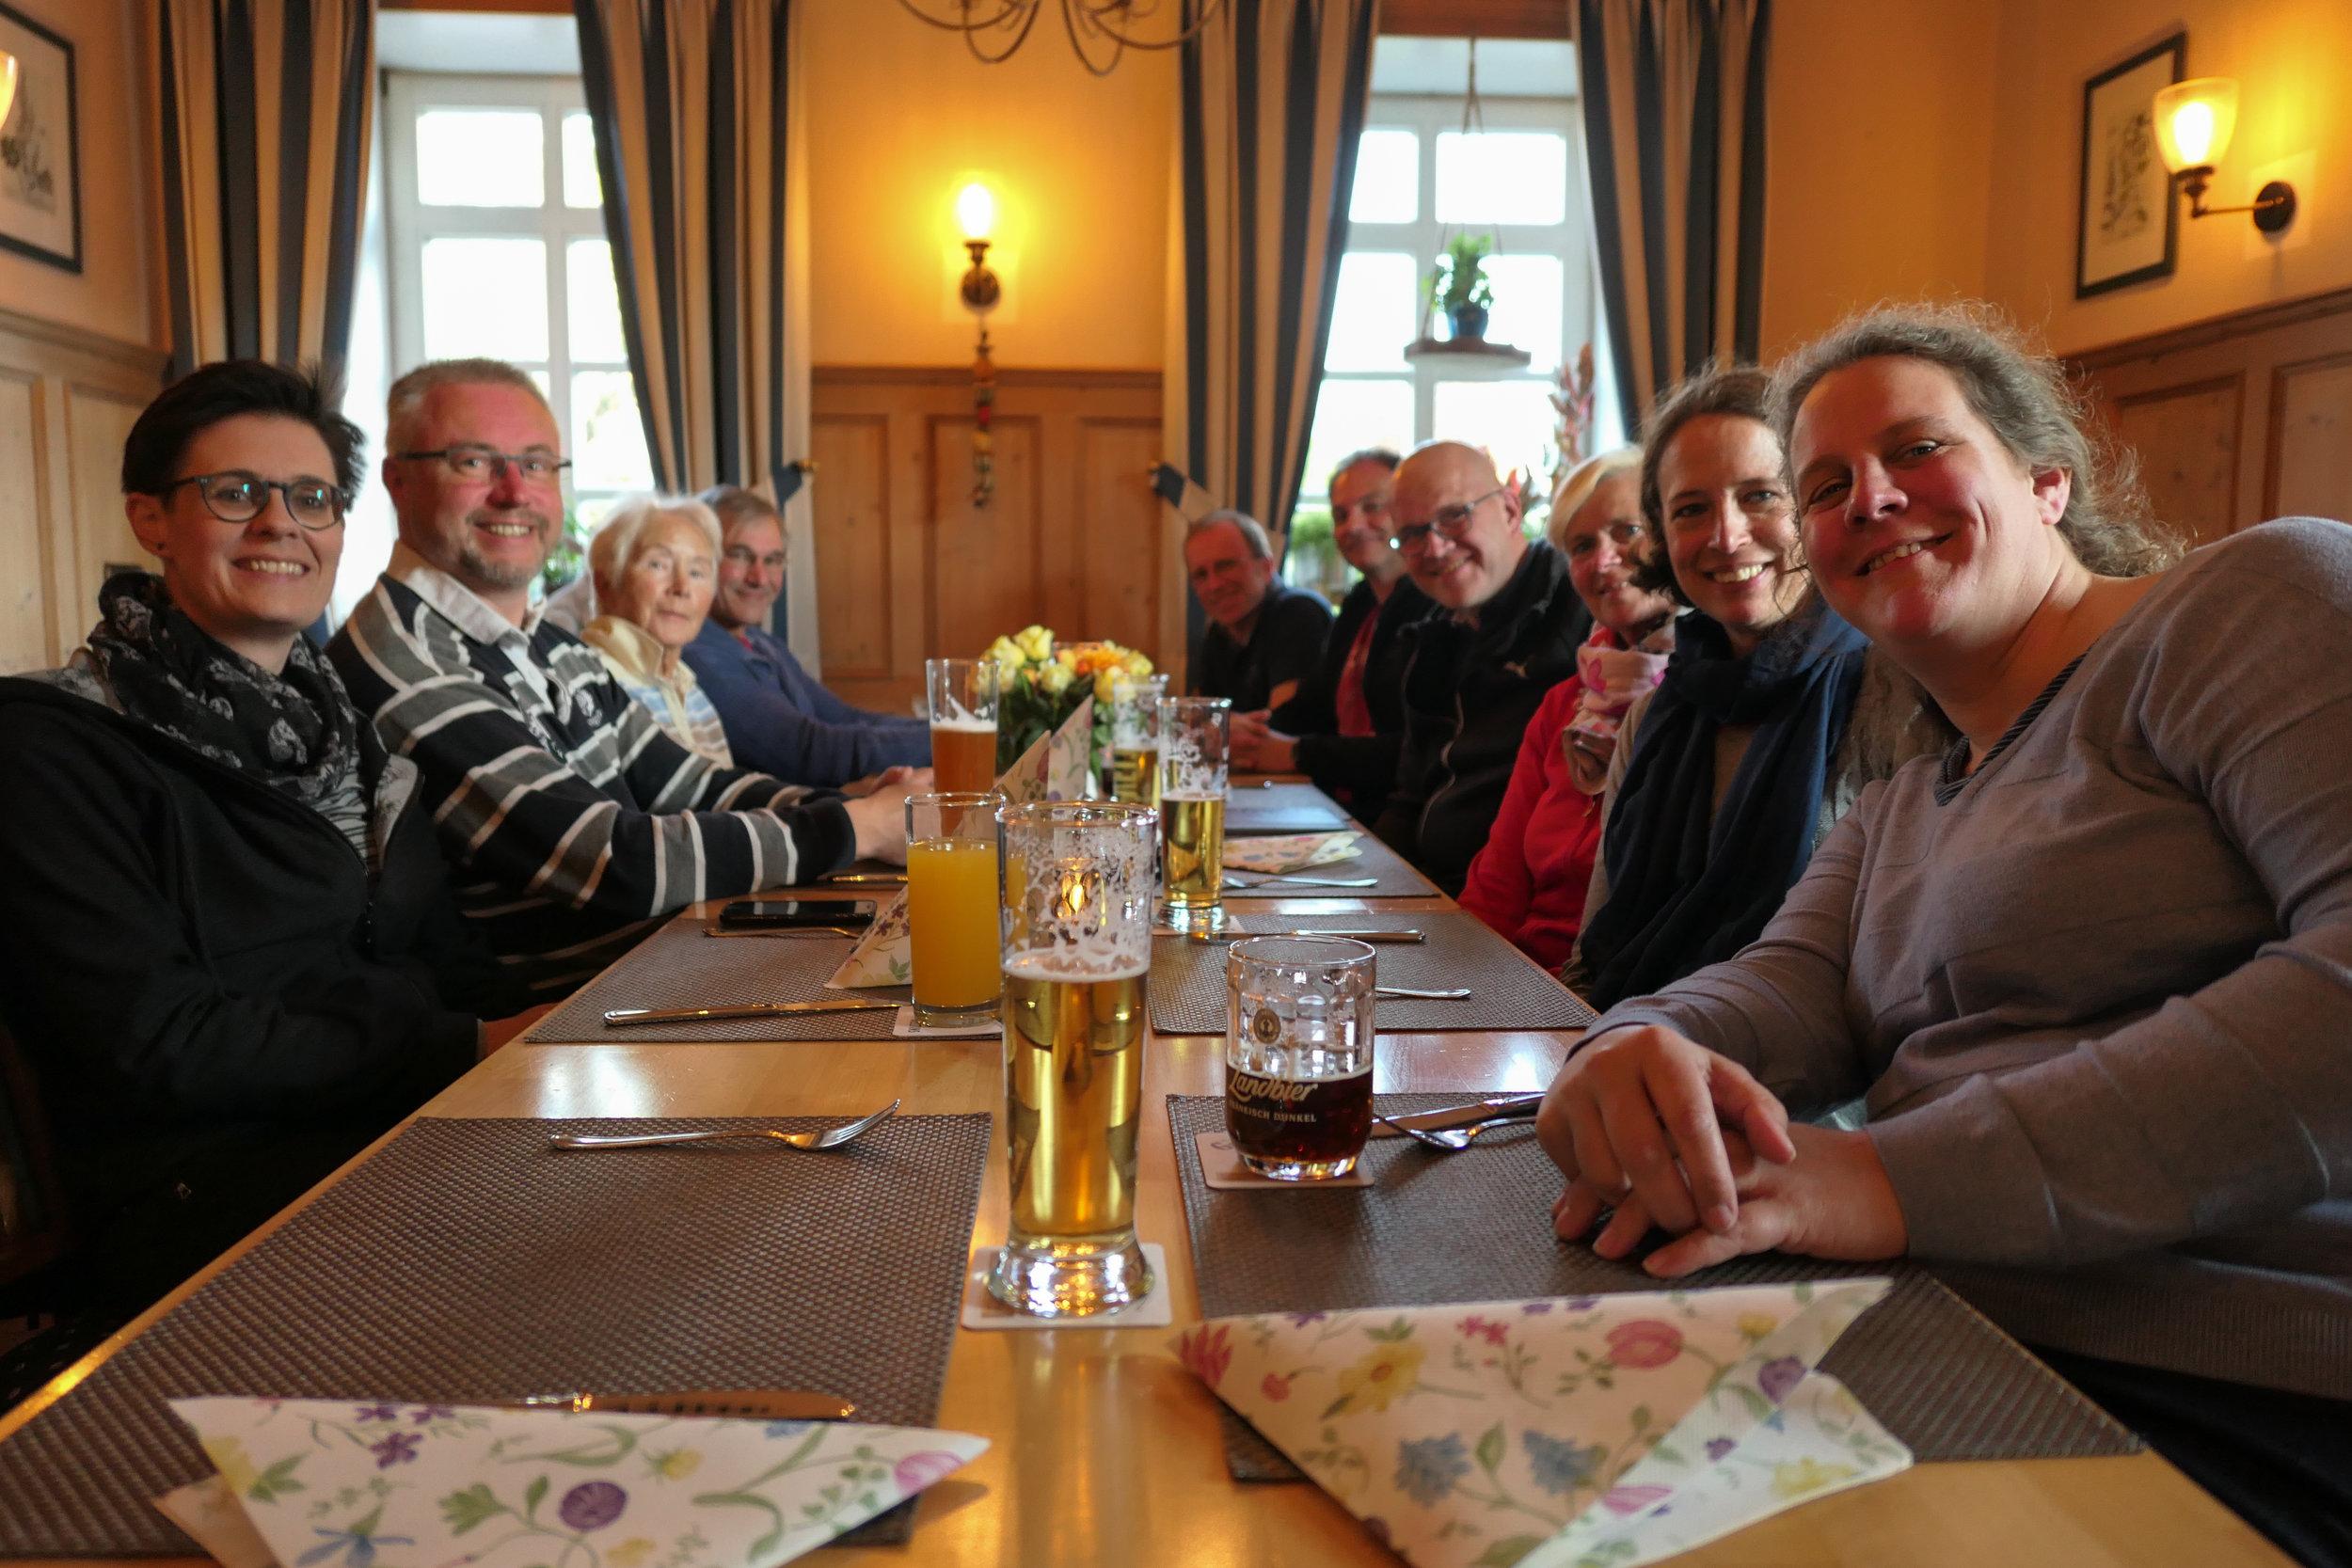 maiwanderfahrt-weser-2019-2_0088_2019-04-28_18-47-08.jpg